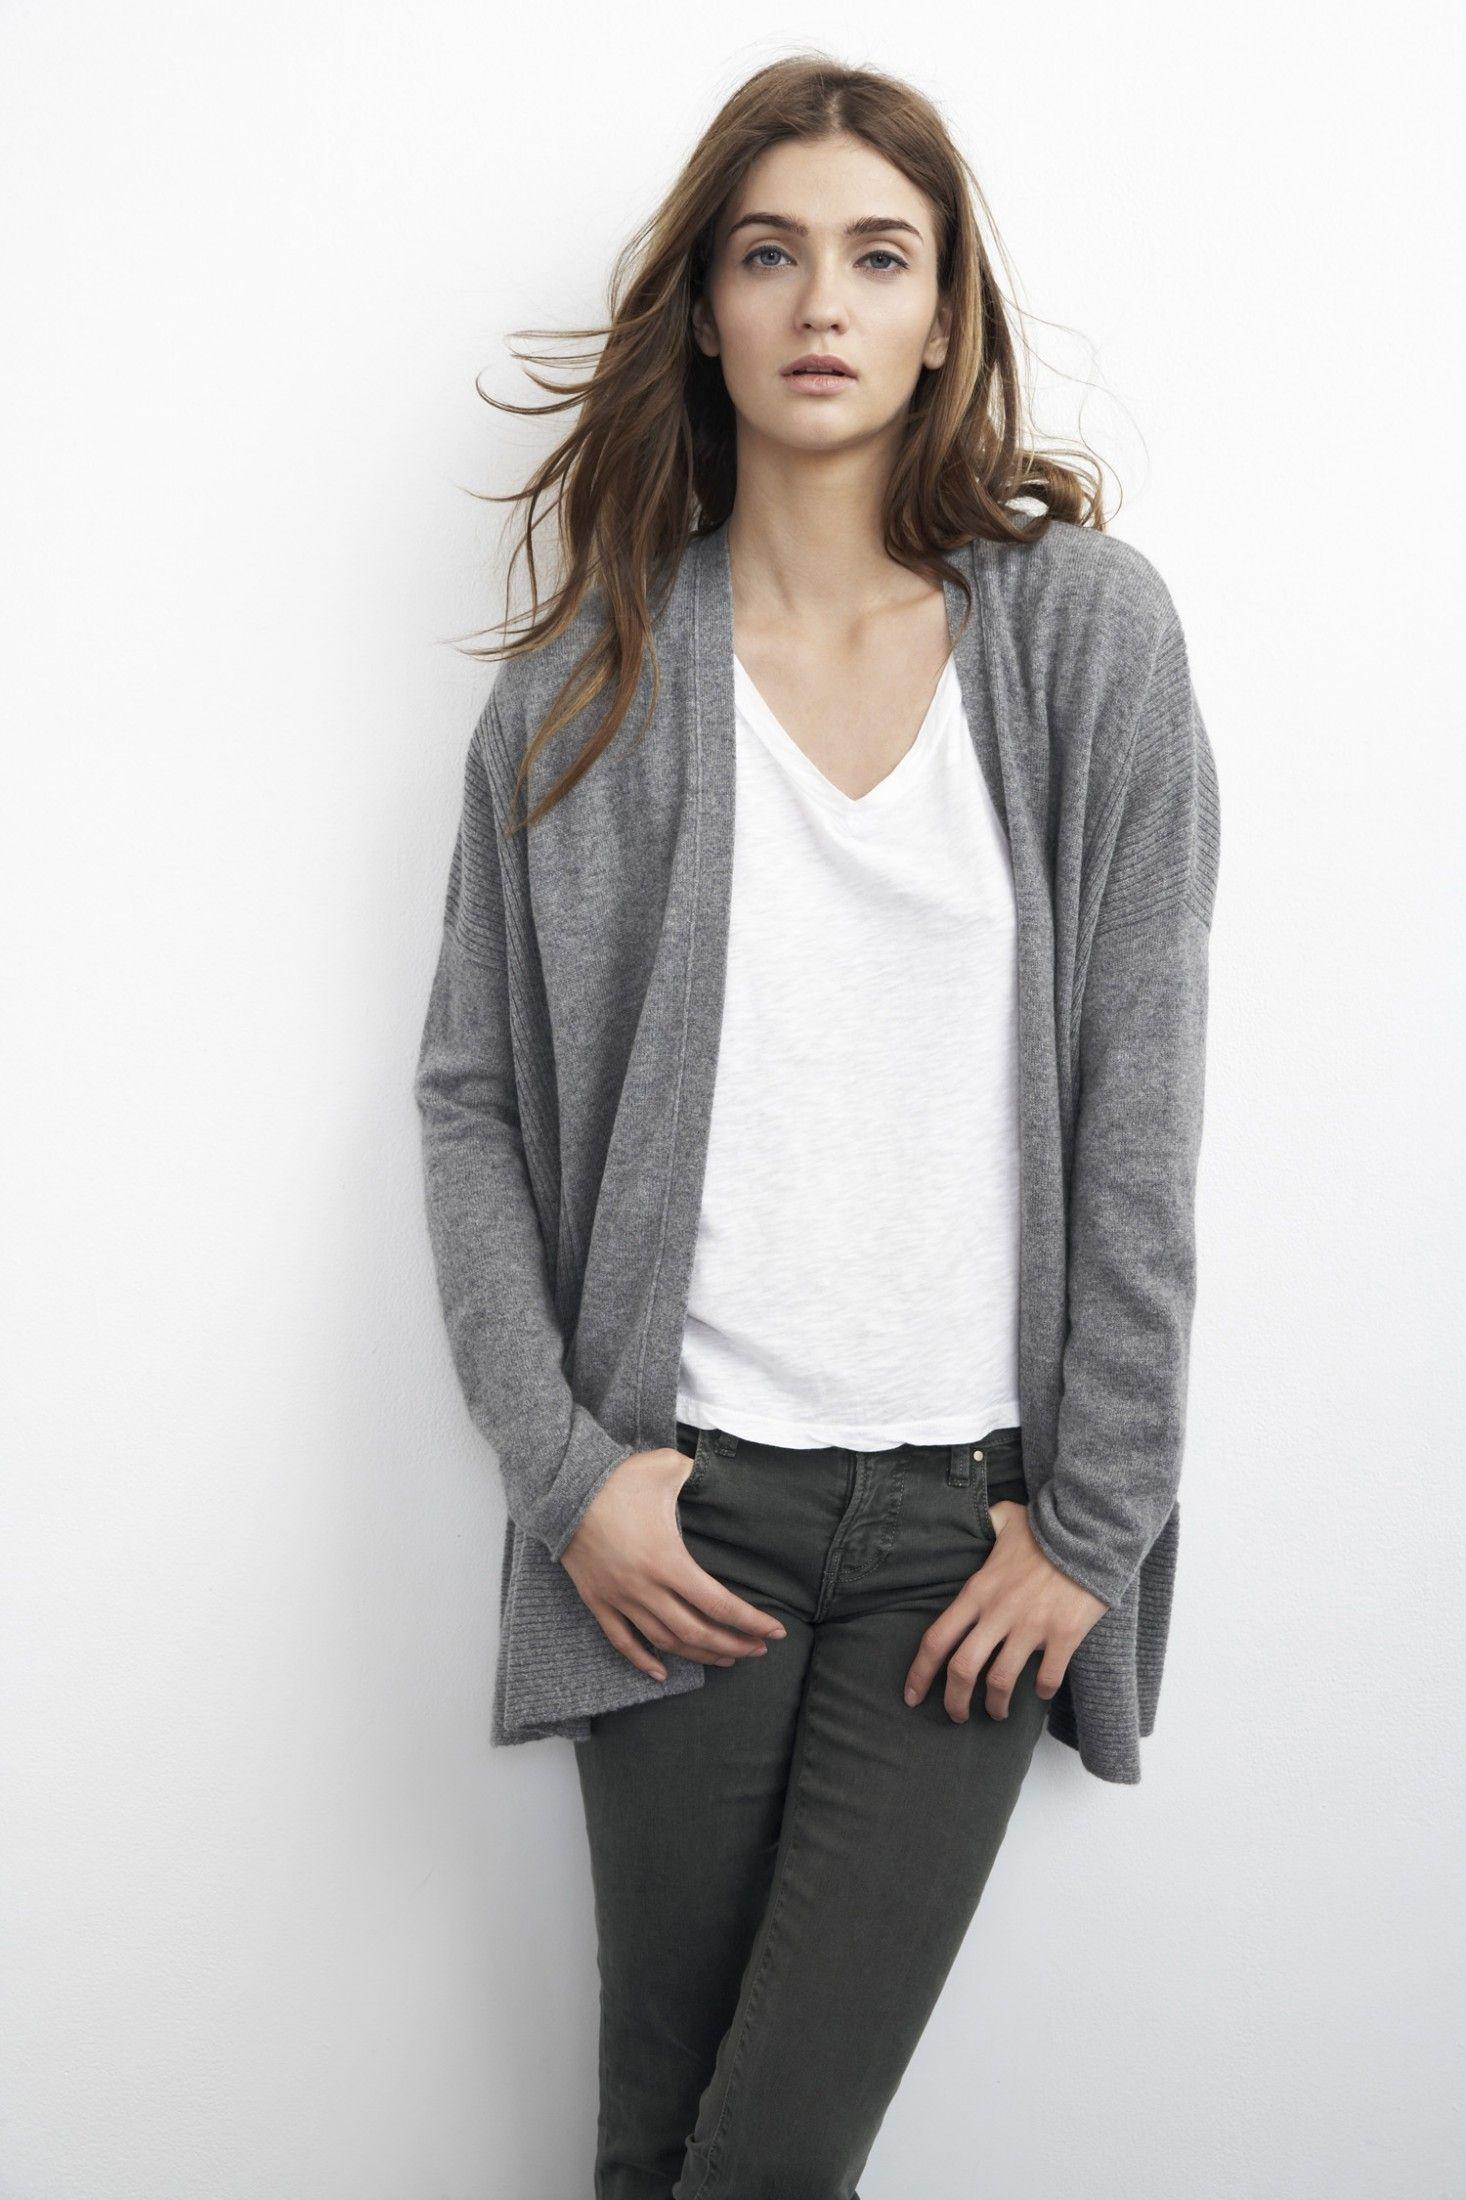 Cashmere Cardigan :: Boyfriend Fit Sweater :: Luxury Cashmere ...